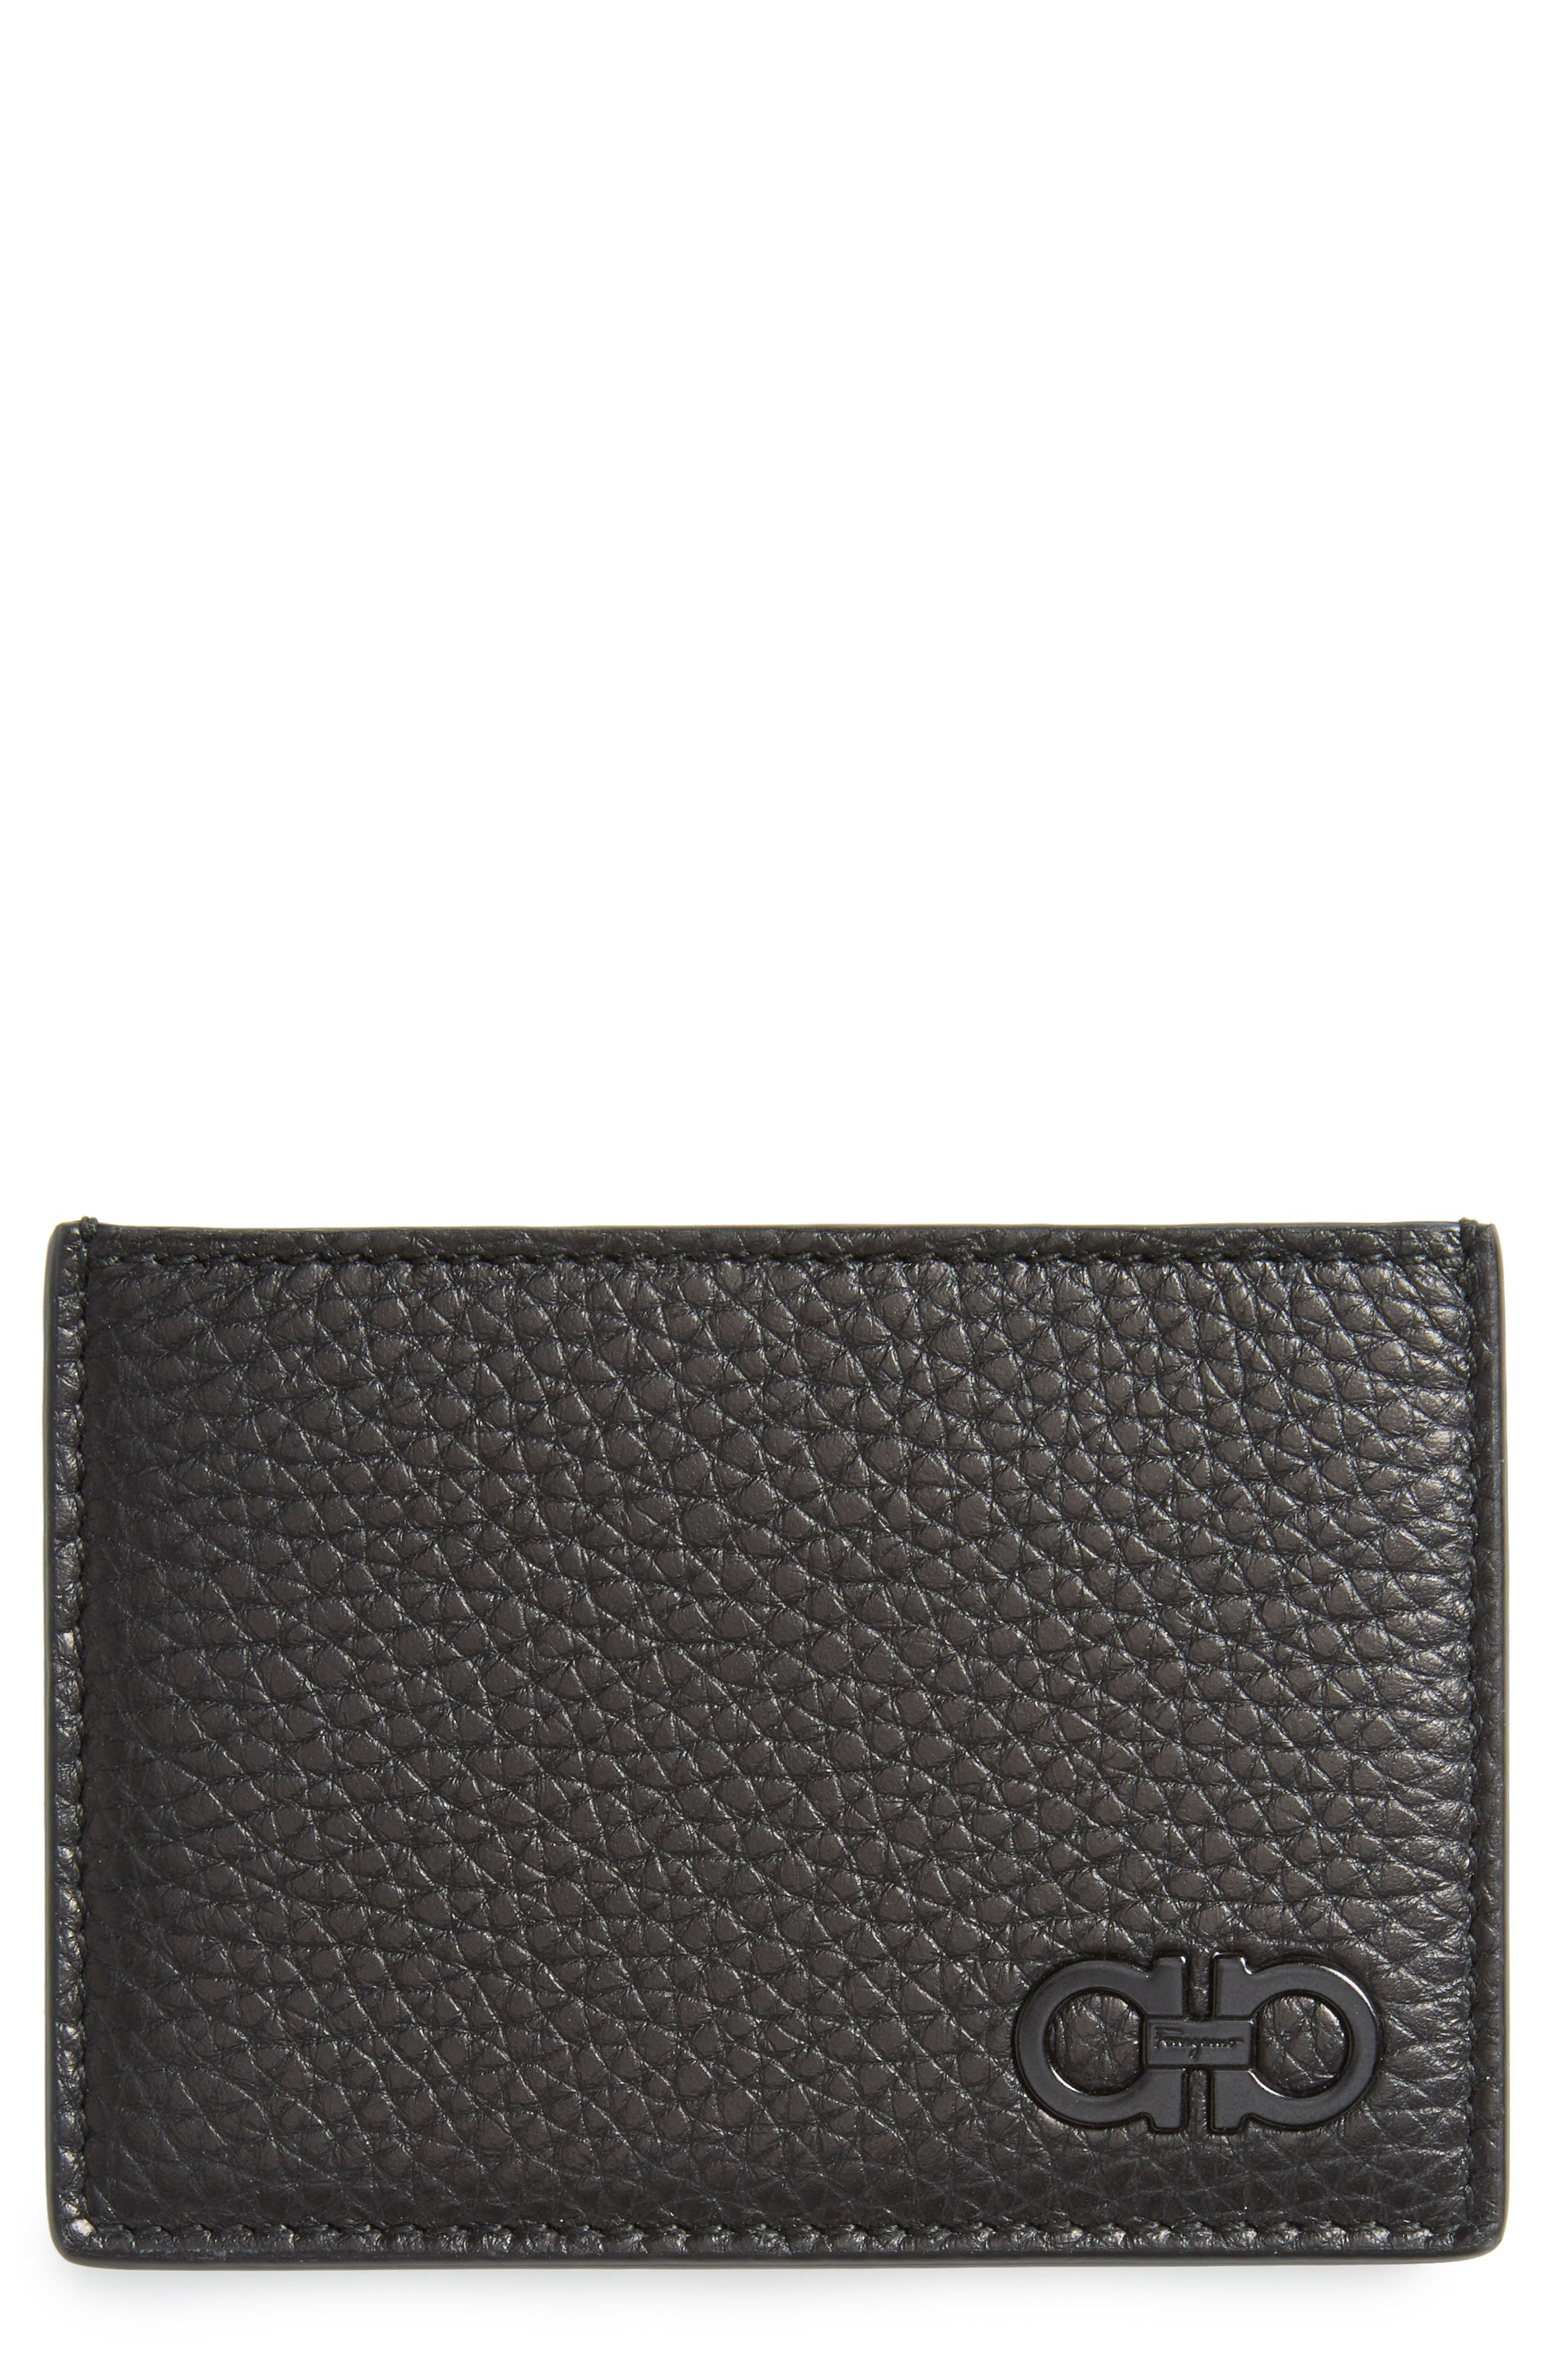 Salvatore Ferragamo Calfskin Leather Card Case